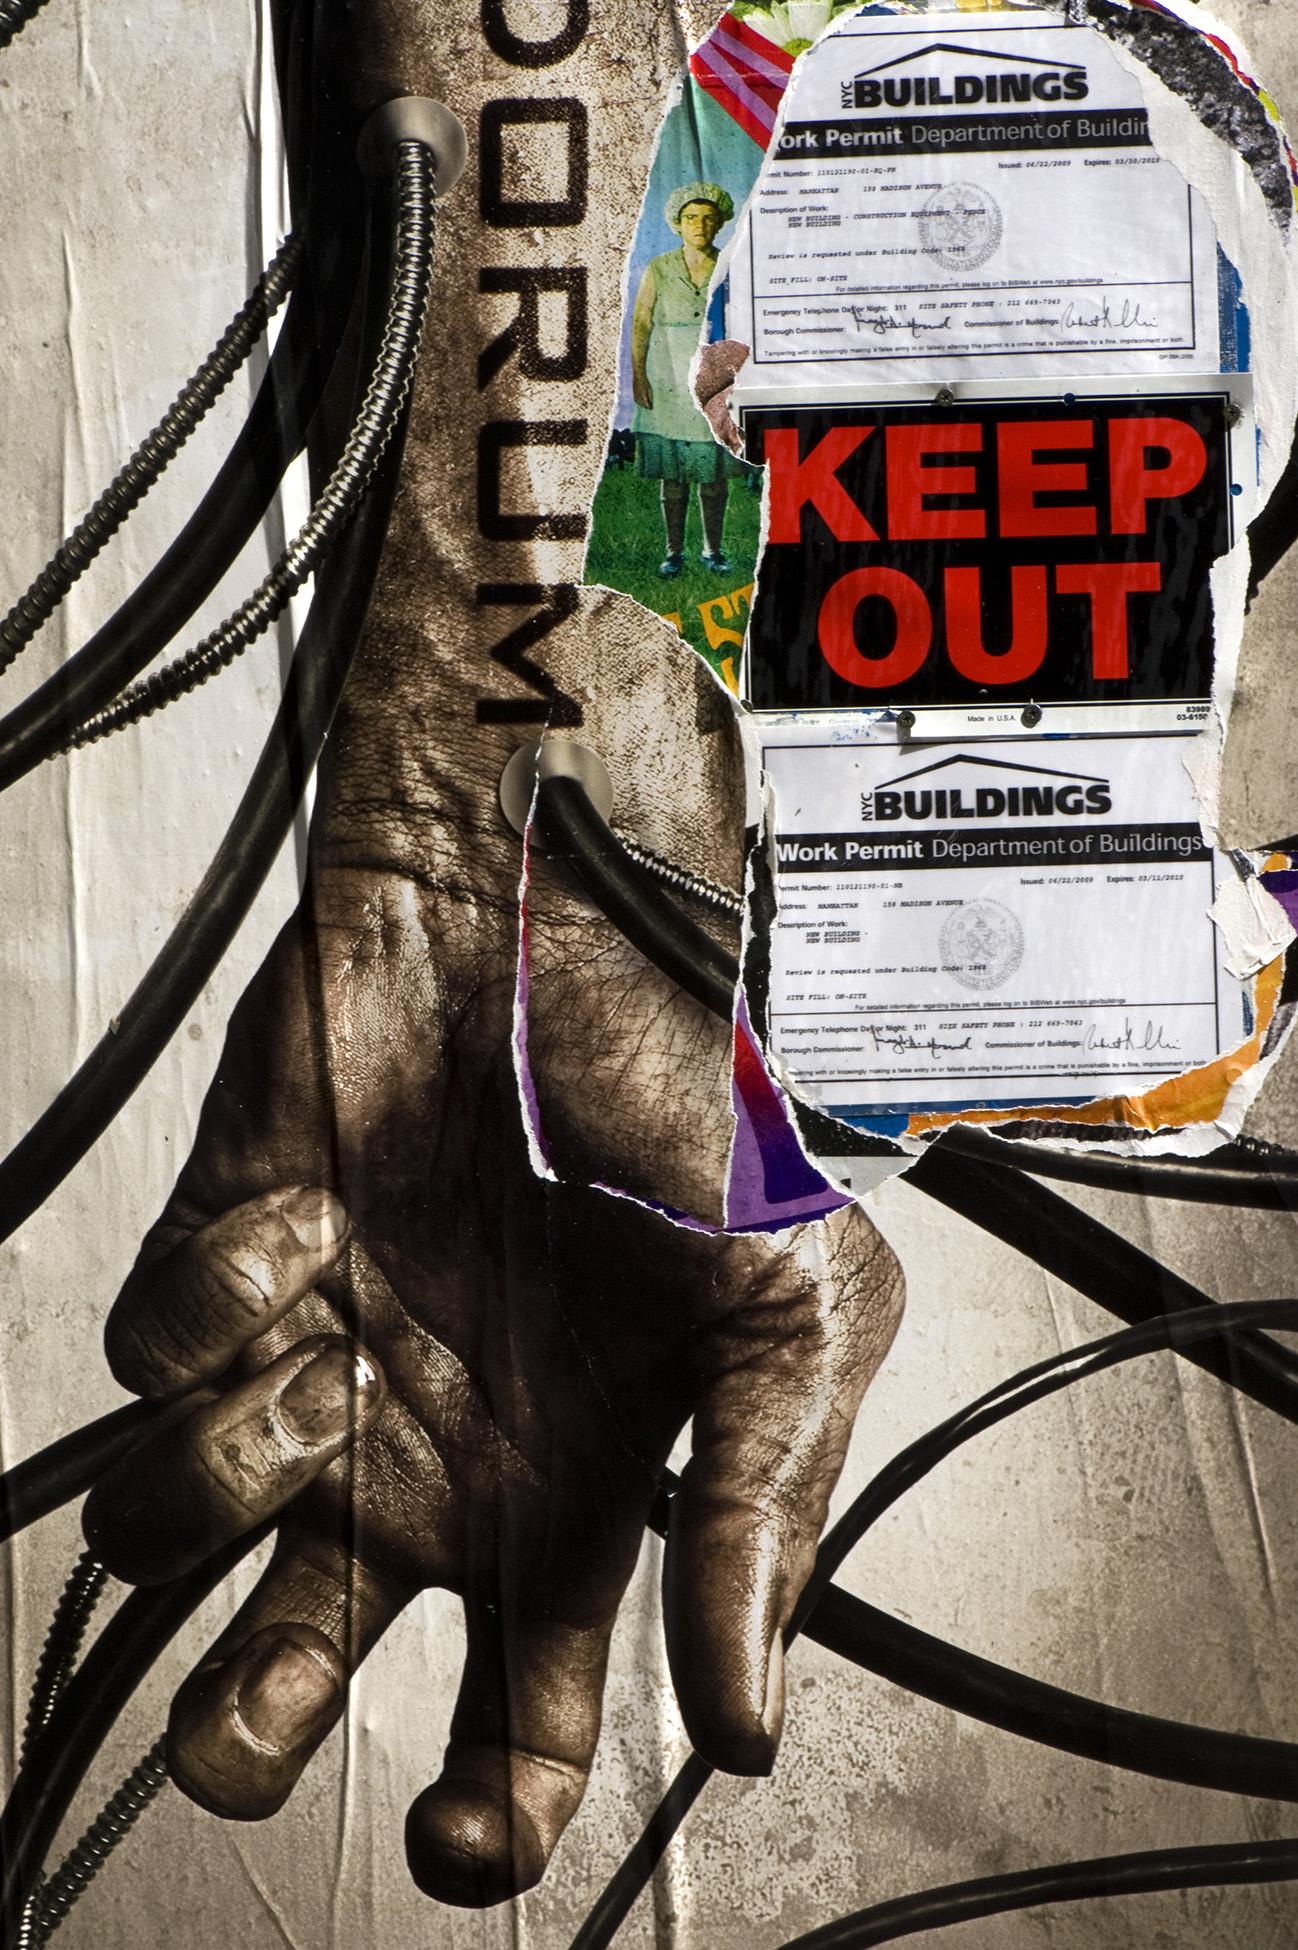 12.Keep Out.jpg